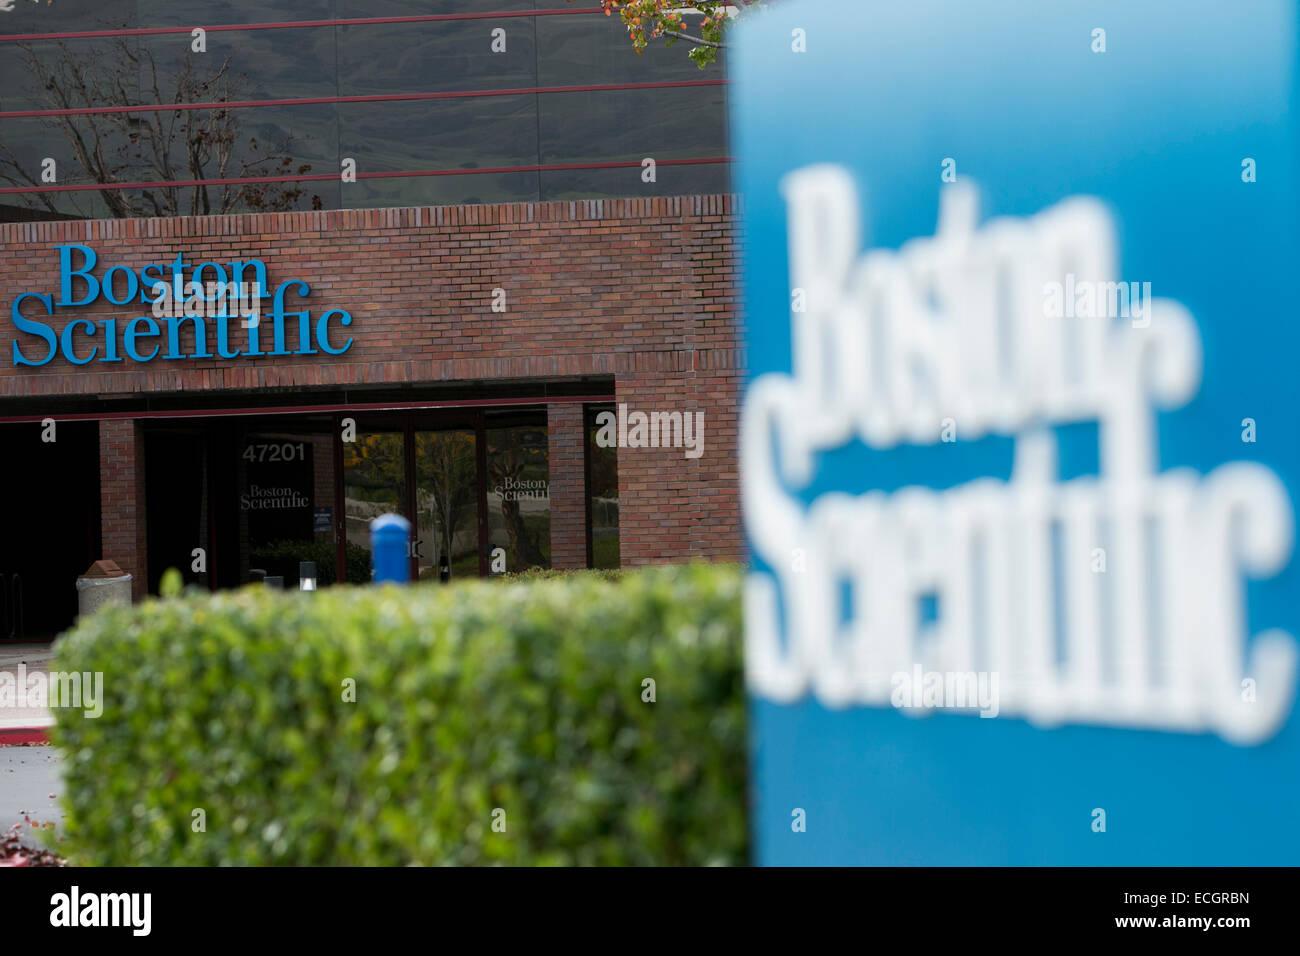 Boston Scientific Logo Sign Stock Photos & Boston Scientific